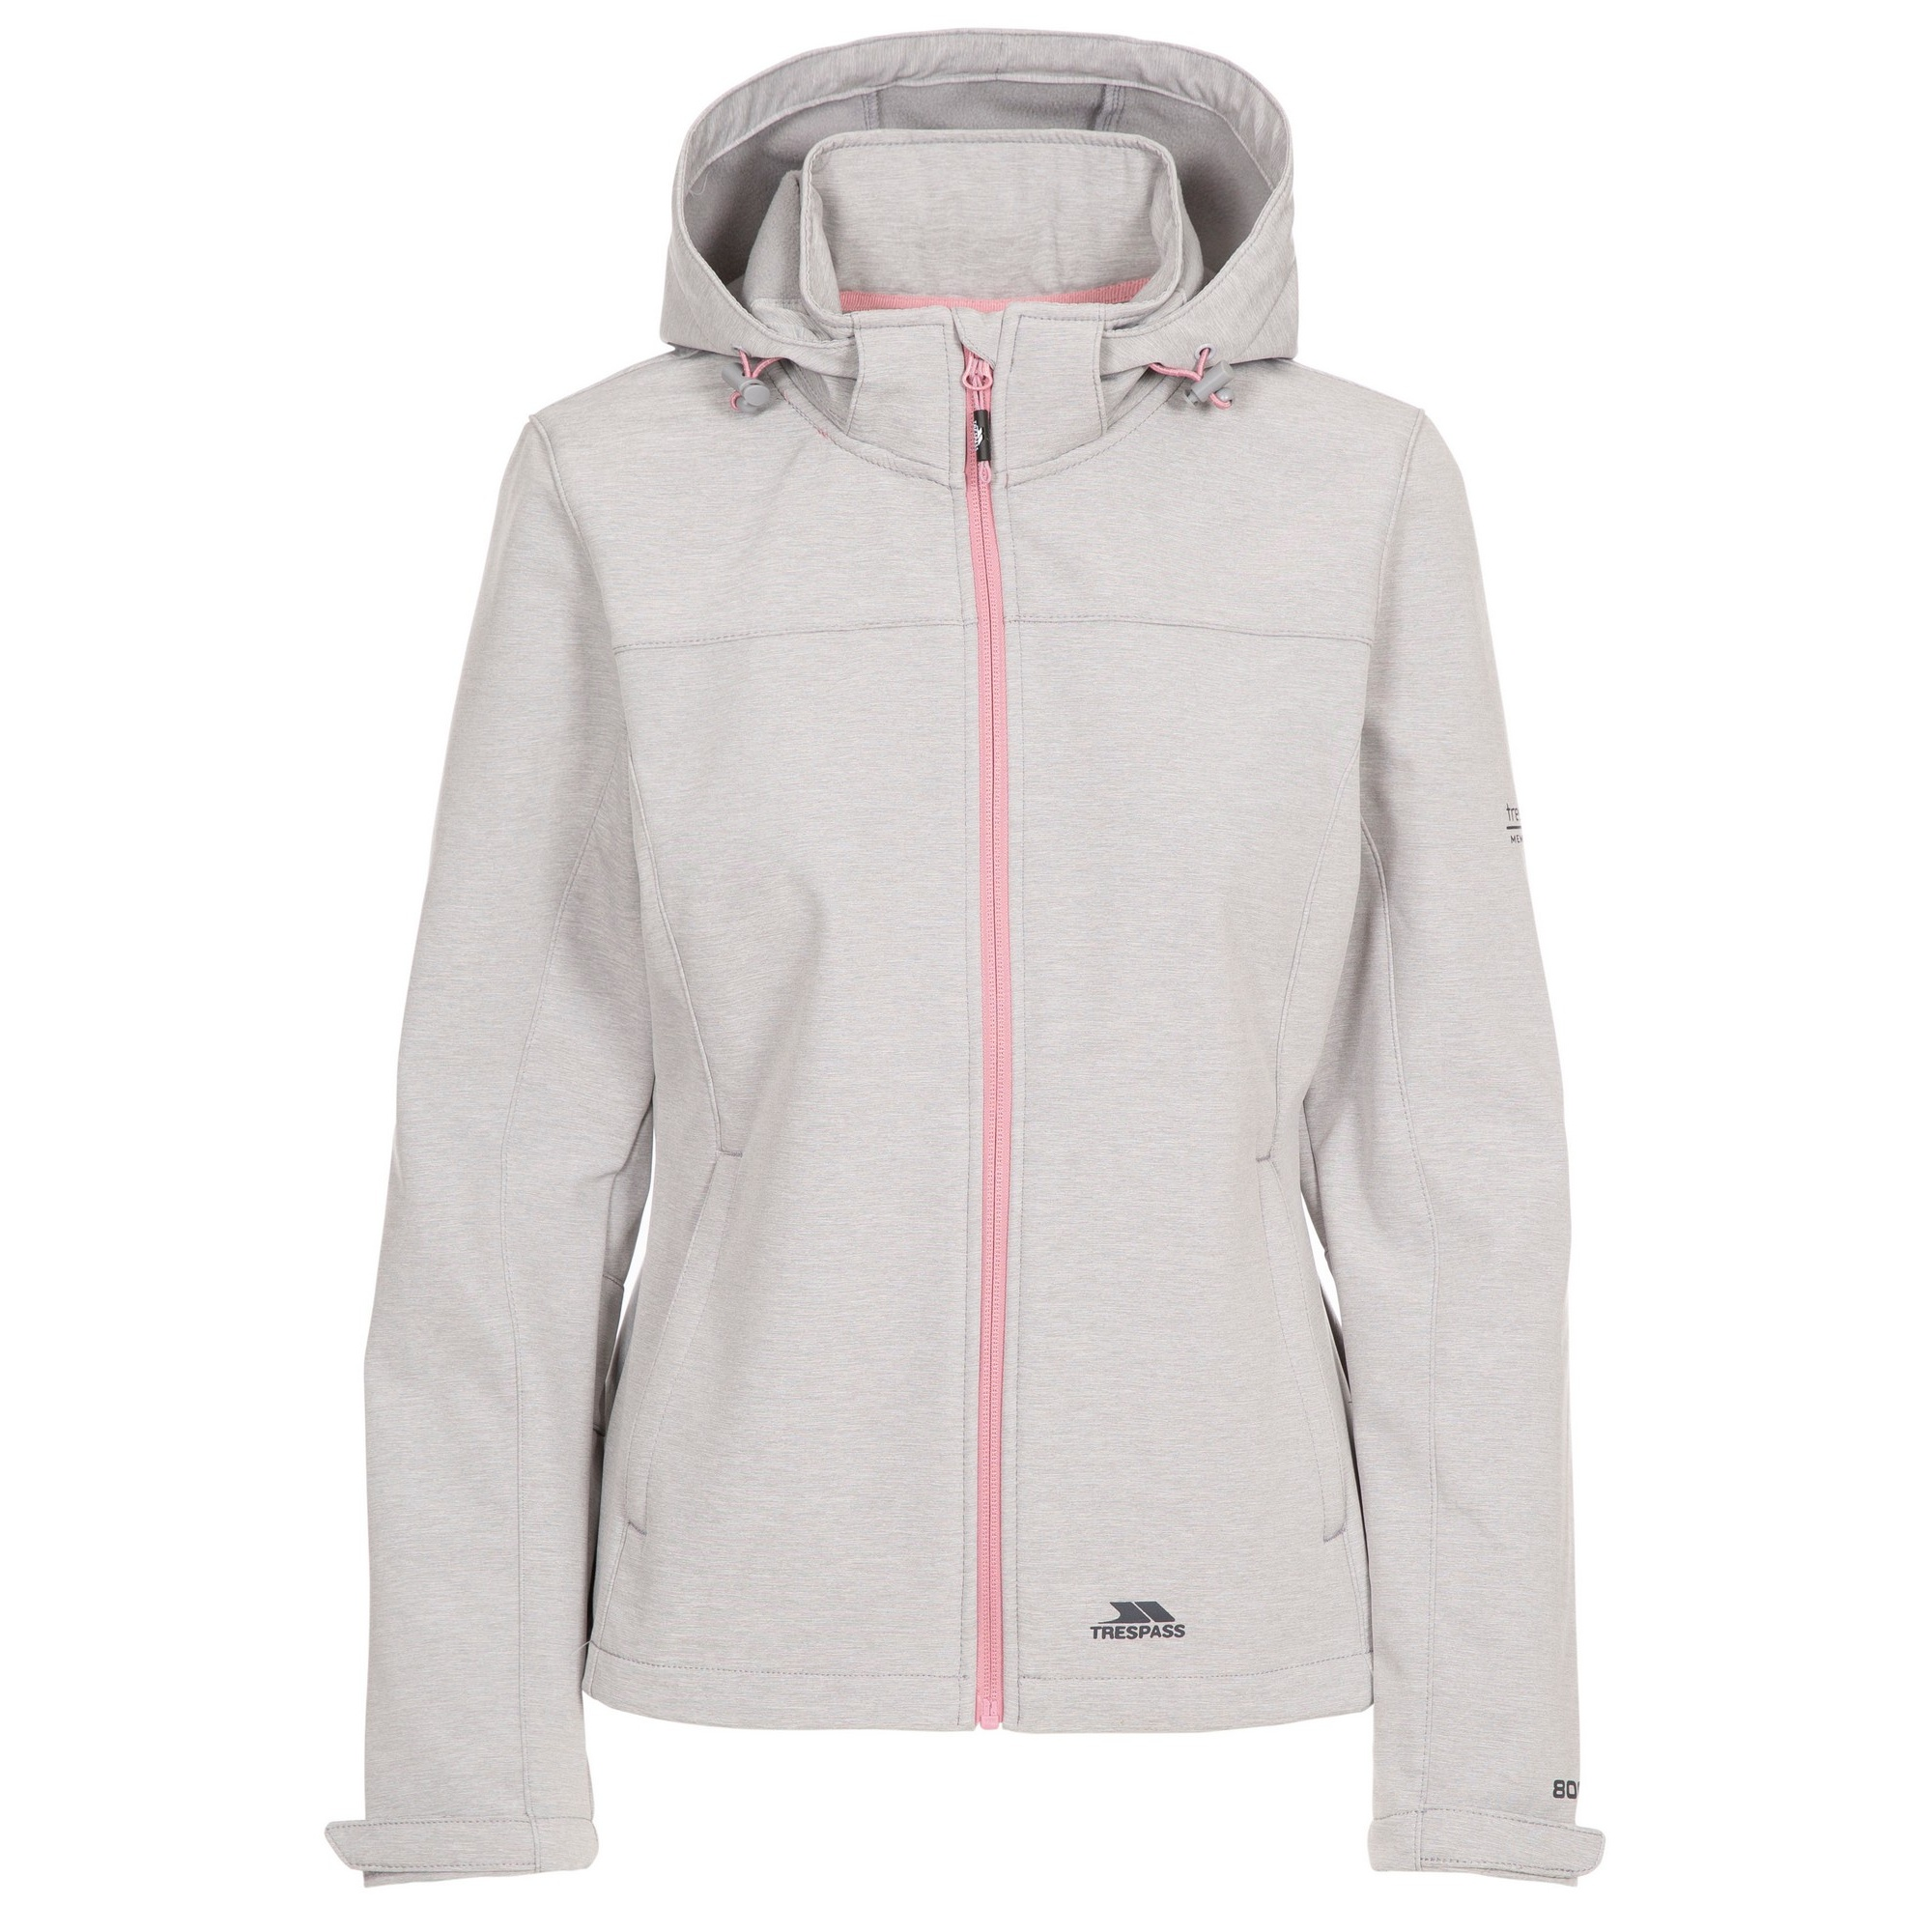 Trespass Womens/Ladies Leah Waterproof Softshell Jacket (S) (Platinum Marl)